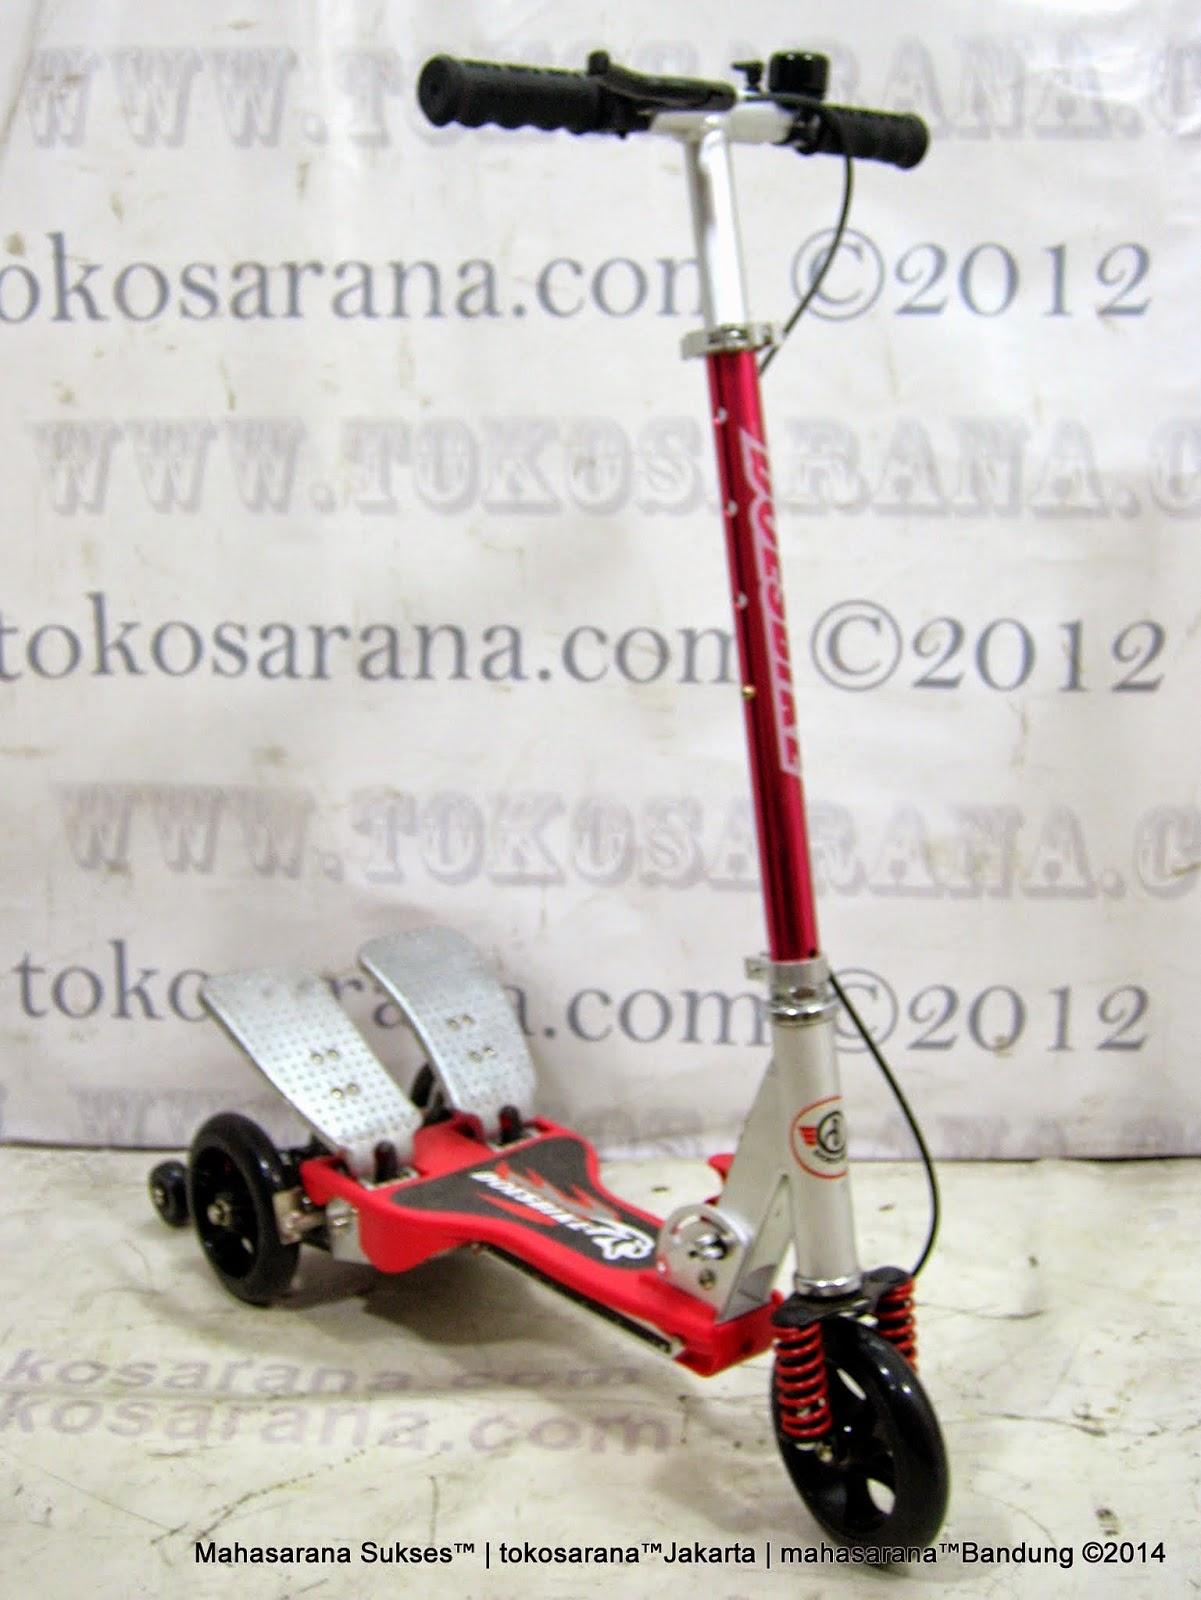 ... Bandung: Skuter Dual Pedal DoesBike S392 Musik Angry Bird dan Lampu